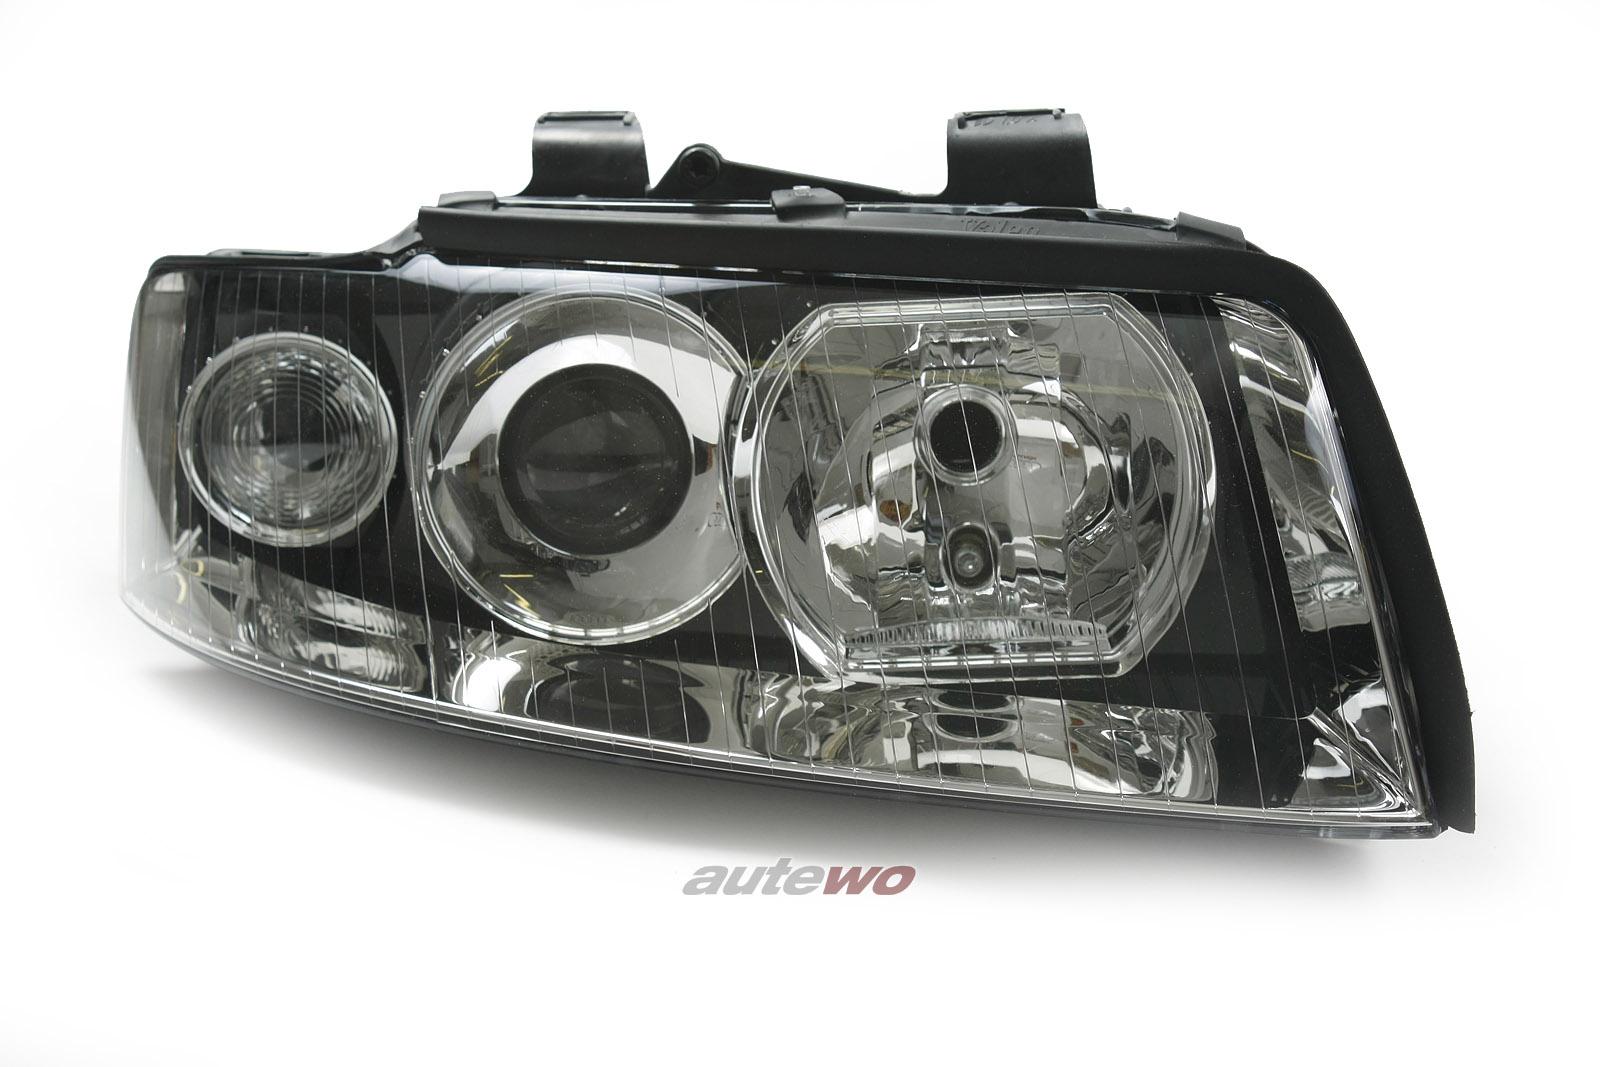 8E0941030AL 89311545 NEU Audi A4 8E Xenon-Scheinwerfer RHD Rechts